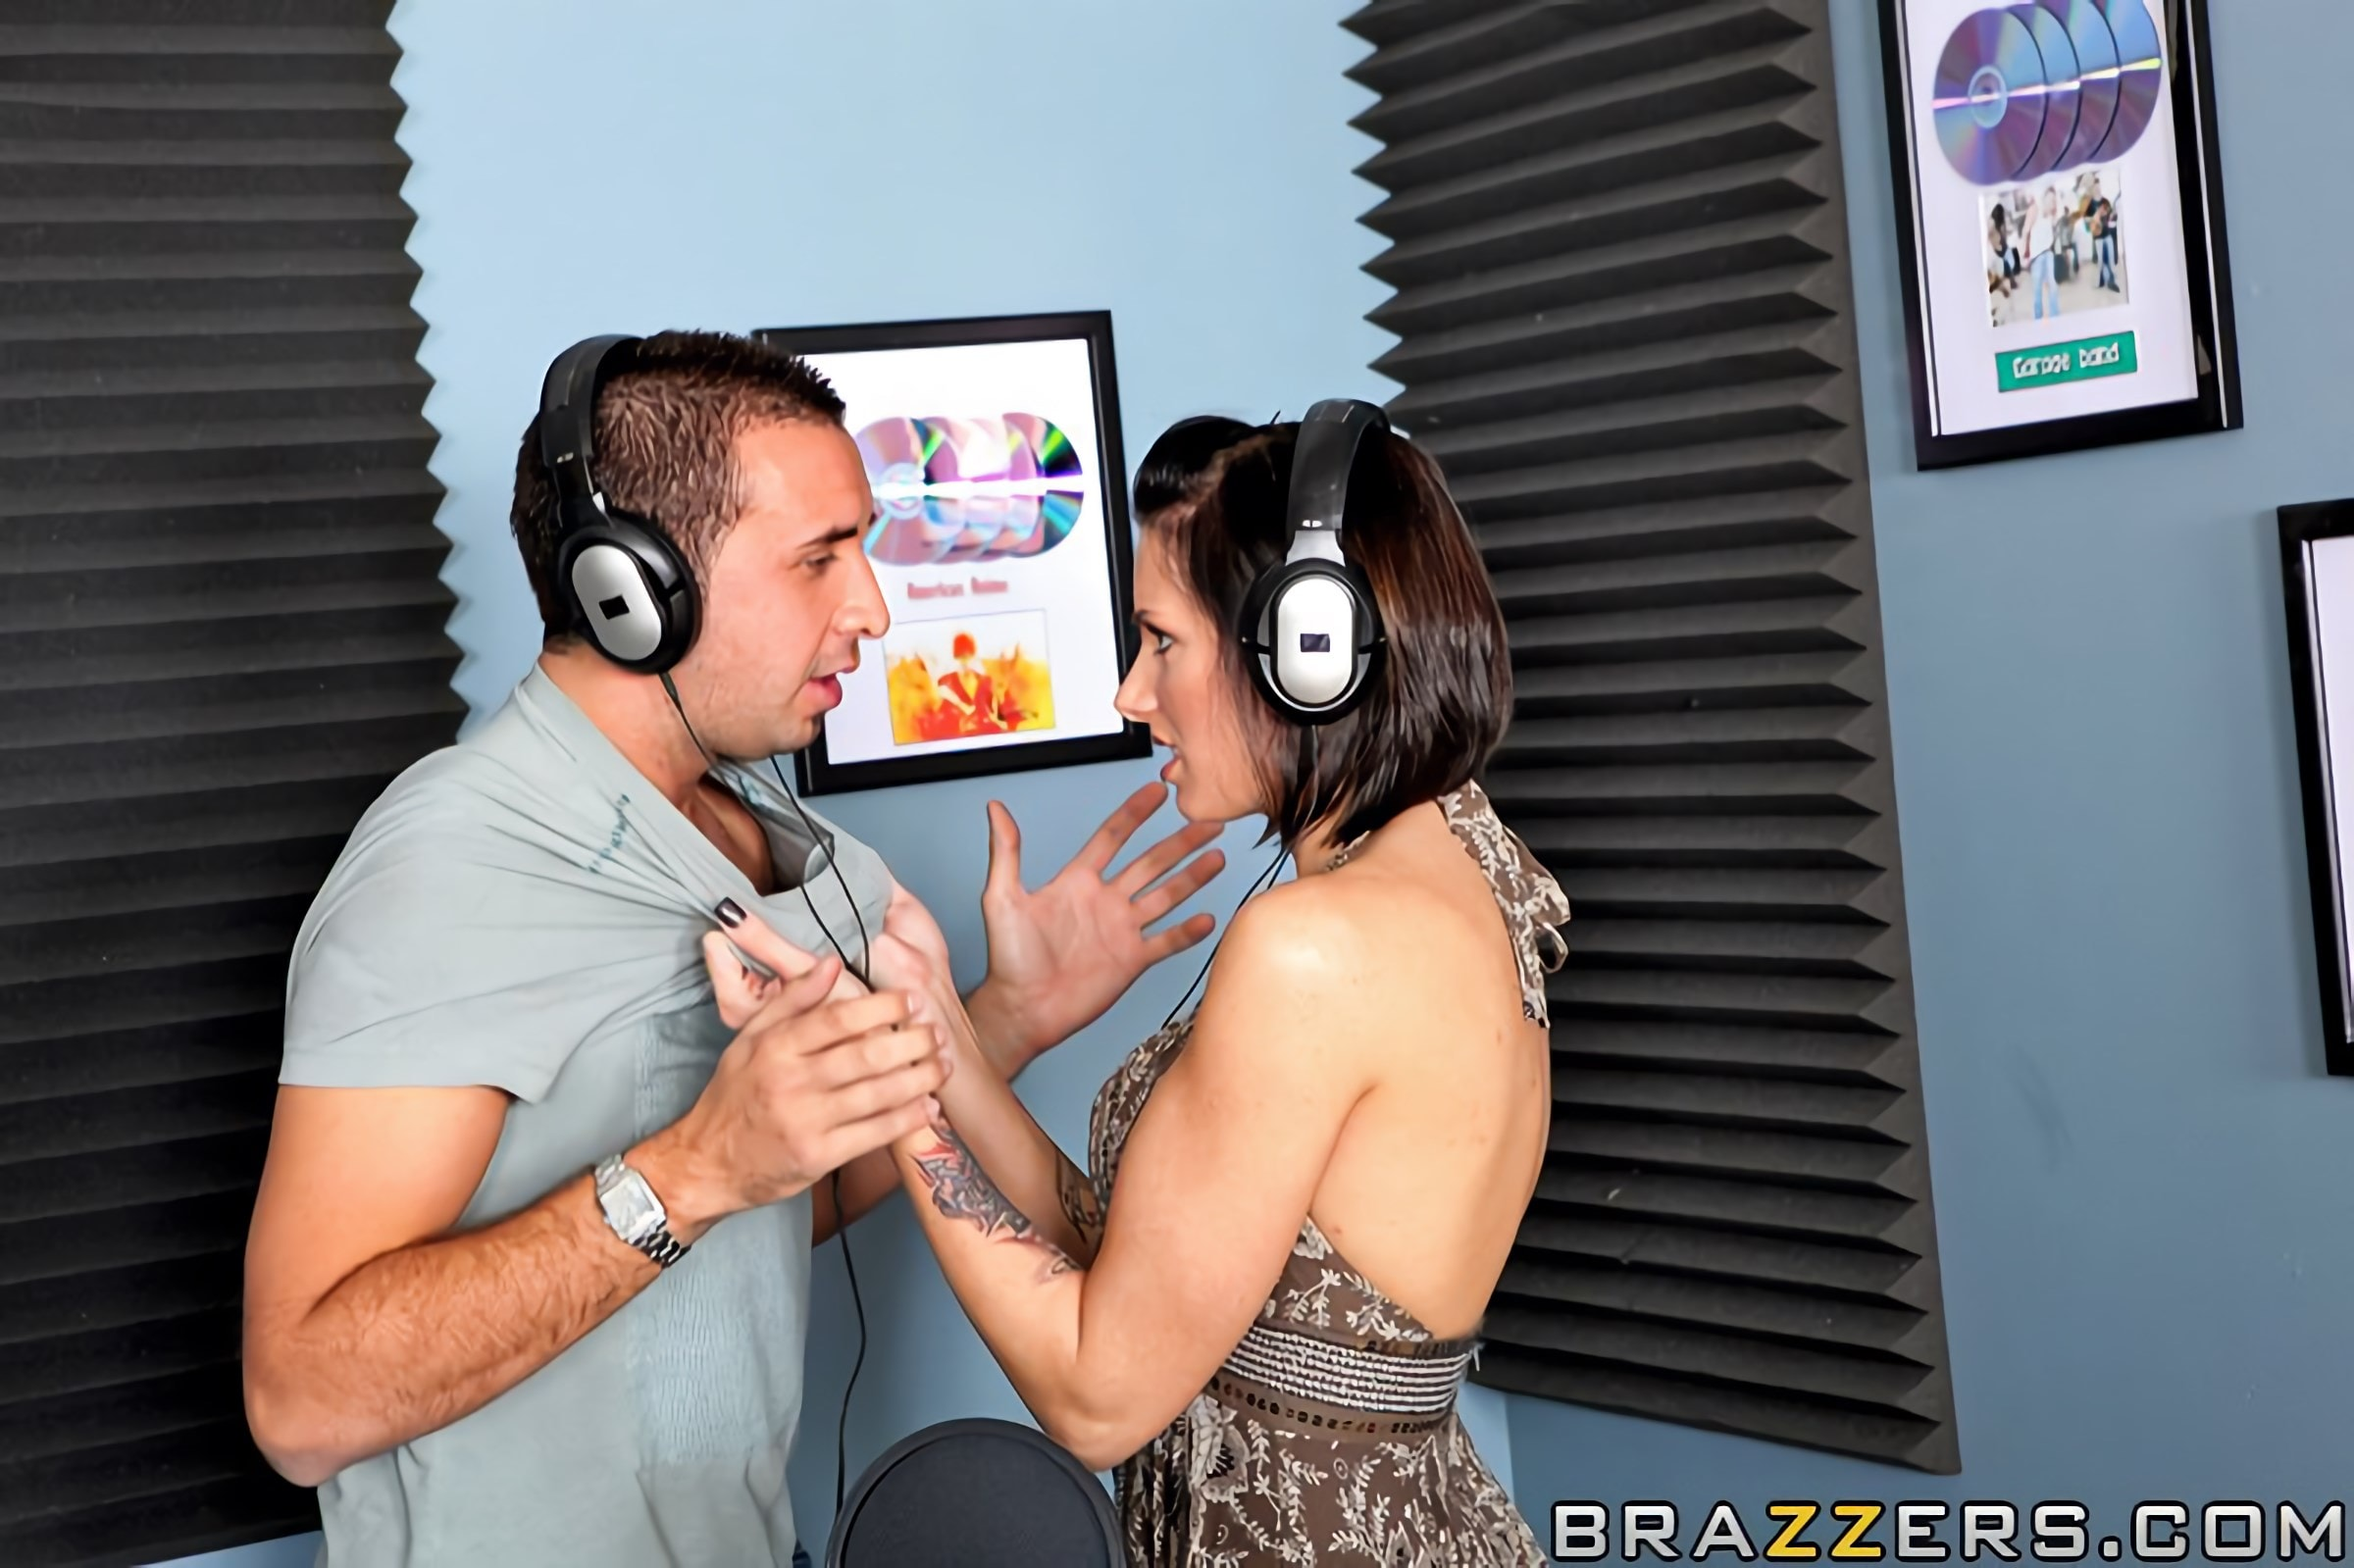 Brazzers 'Battle of the Daisies' starring Juelz Ventura (Photo 6)